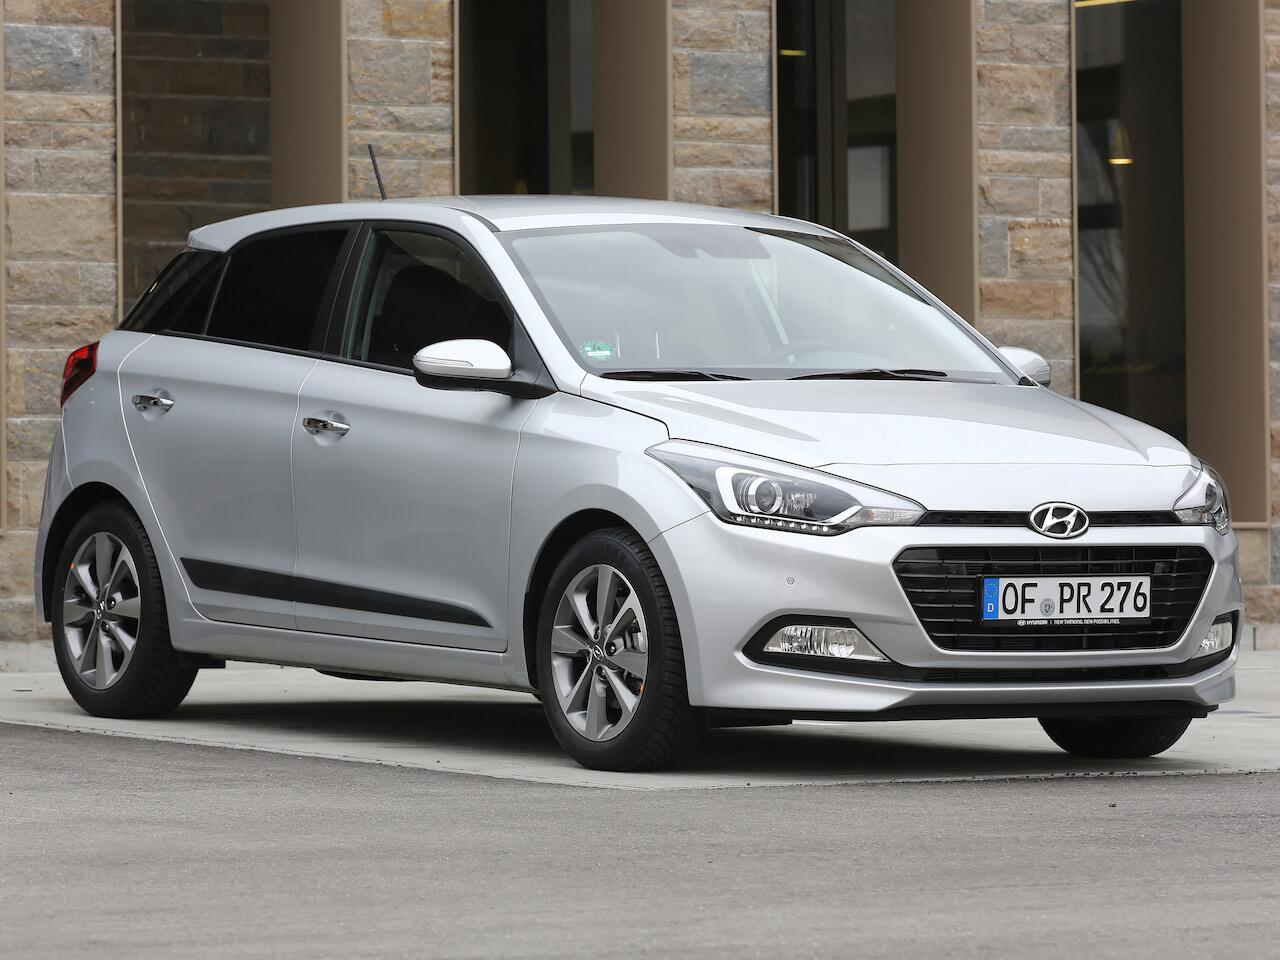 Bild zu Platz 7: Hyundai i20